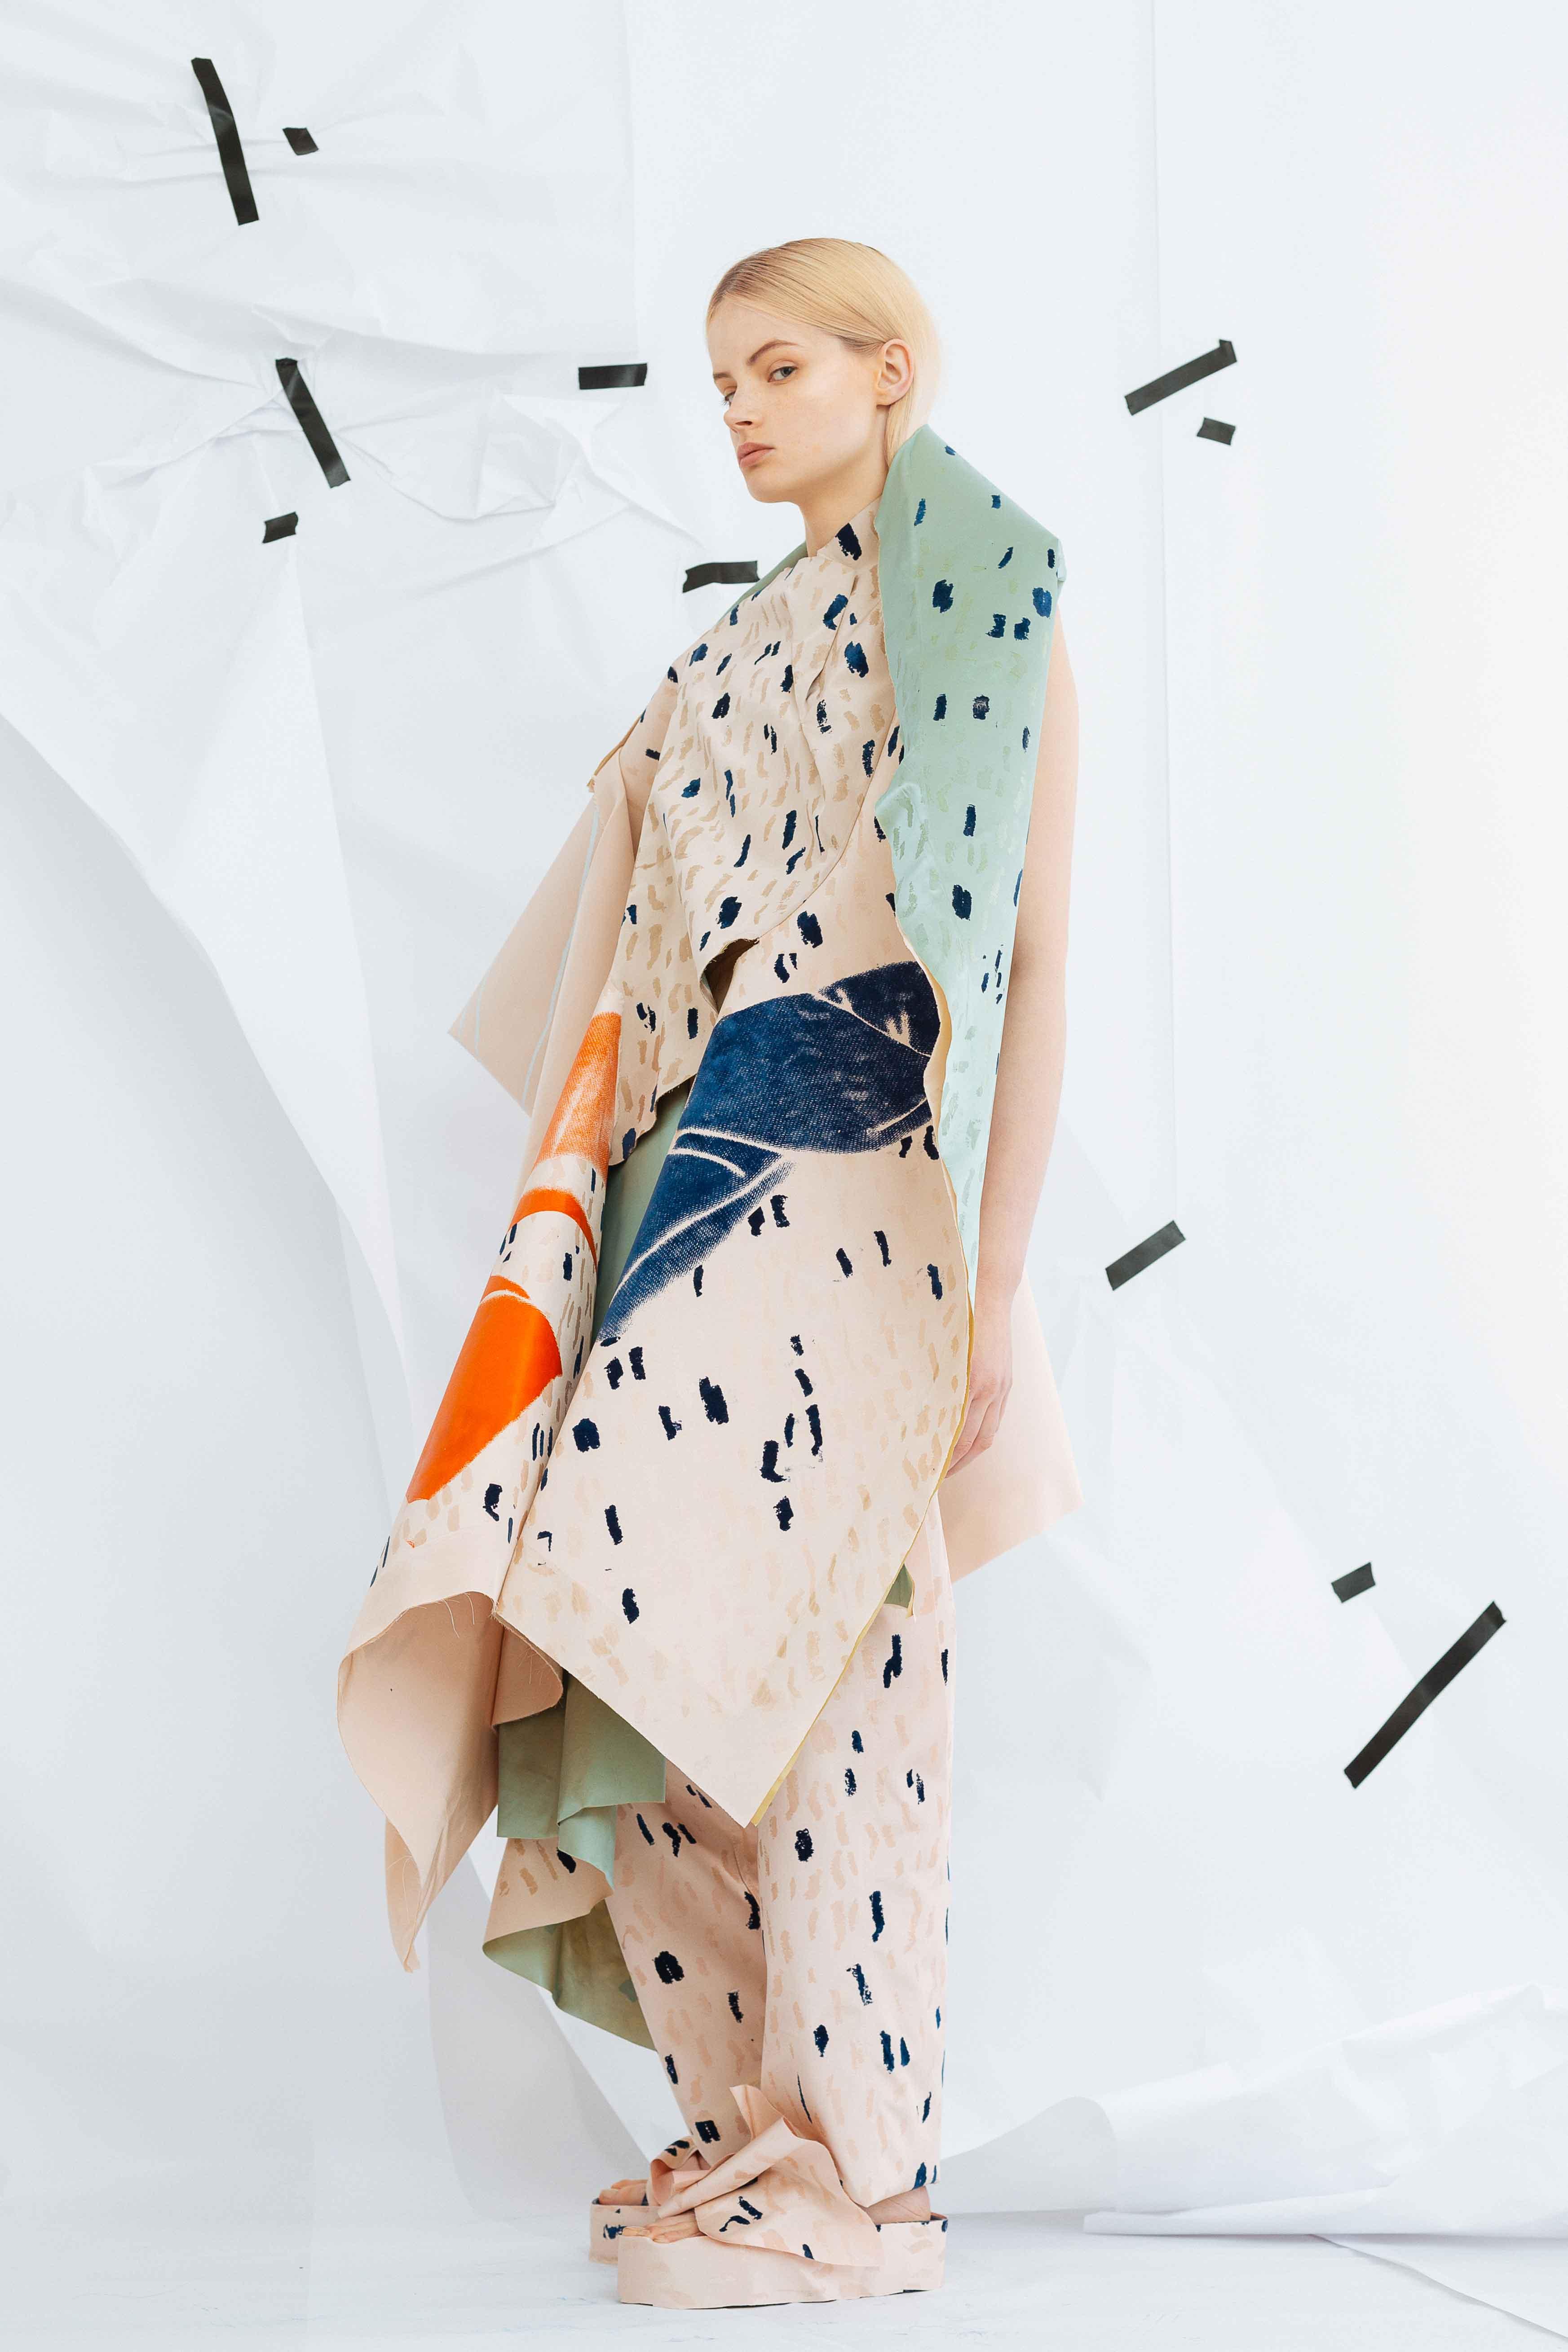 Fotini-Handra-Prints-by-Sarah-Forgie-model-KarolinaM-Simonas-Berukstis-MAU-So-Jeong-Kim.jpg